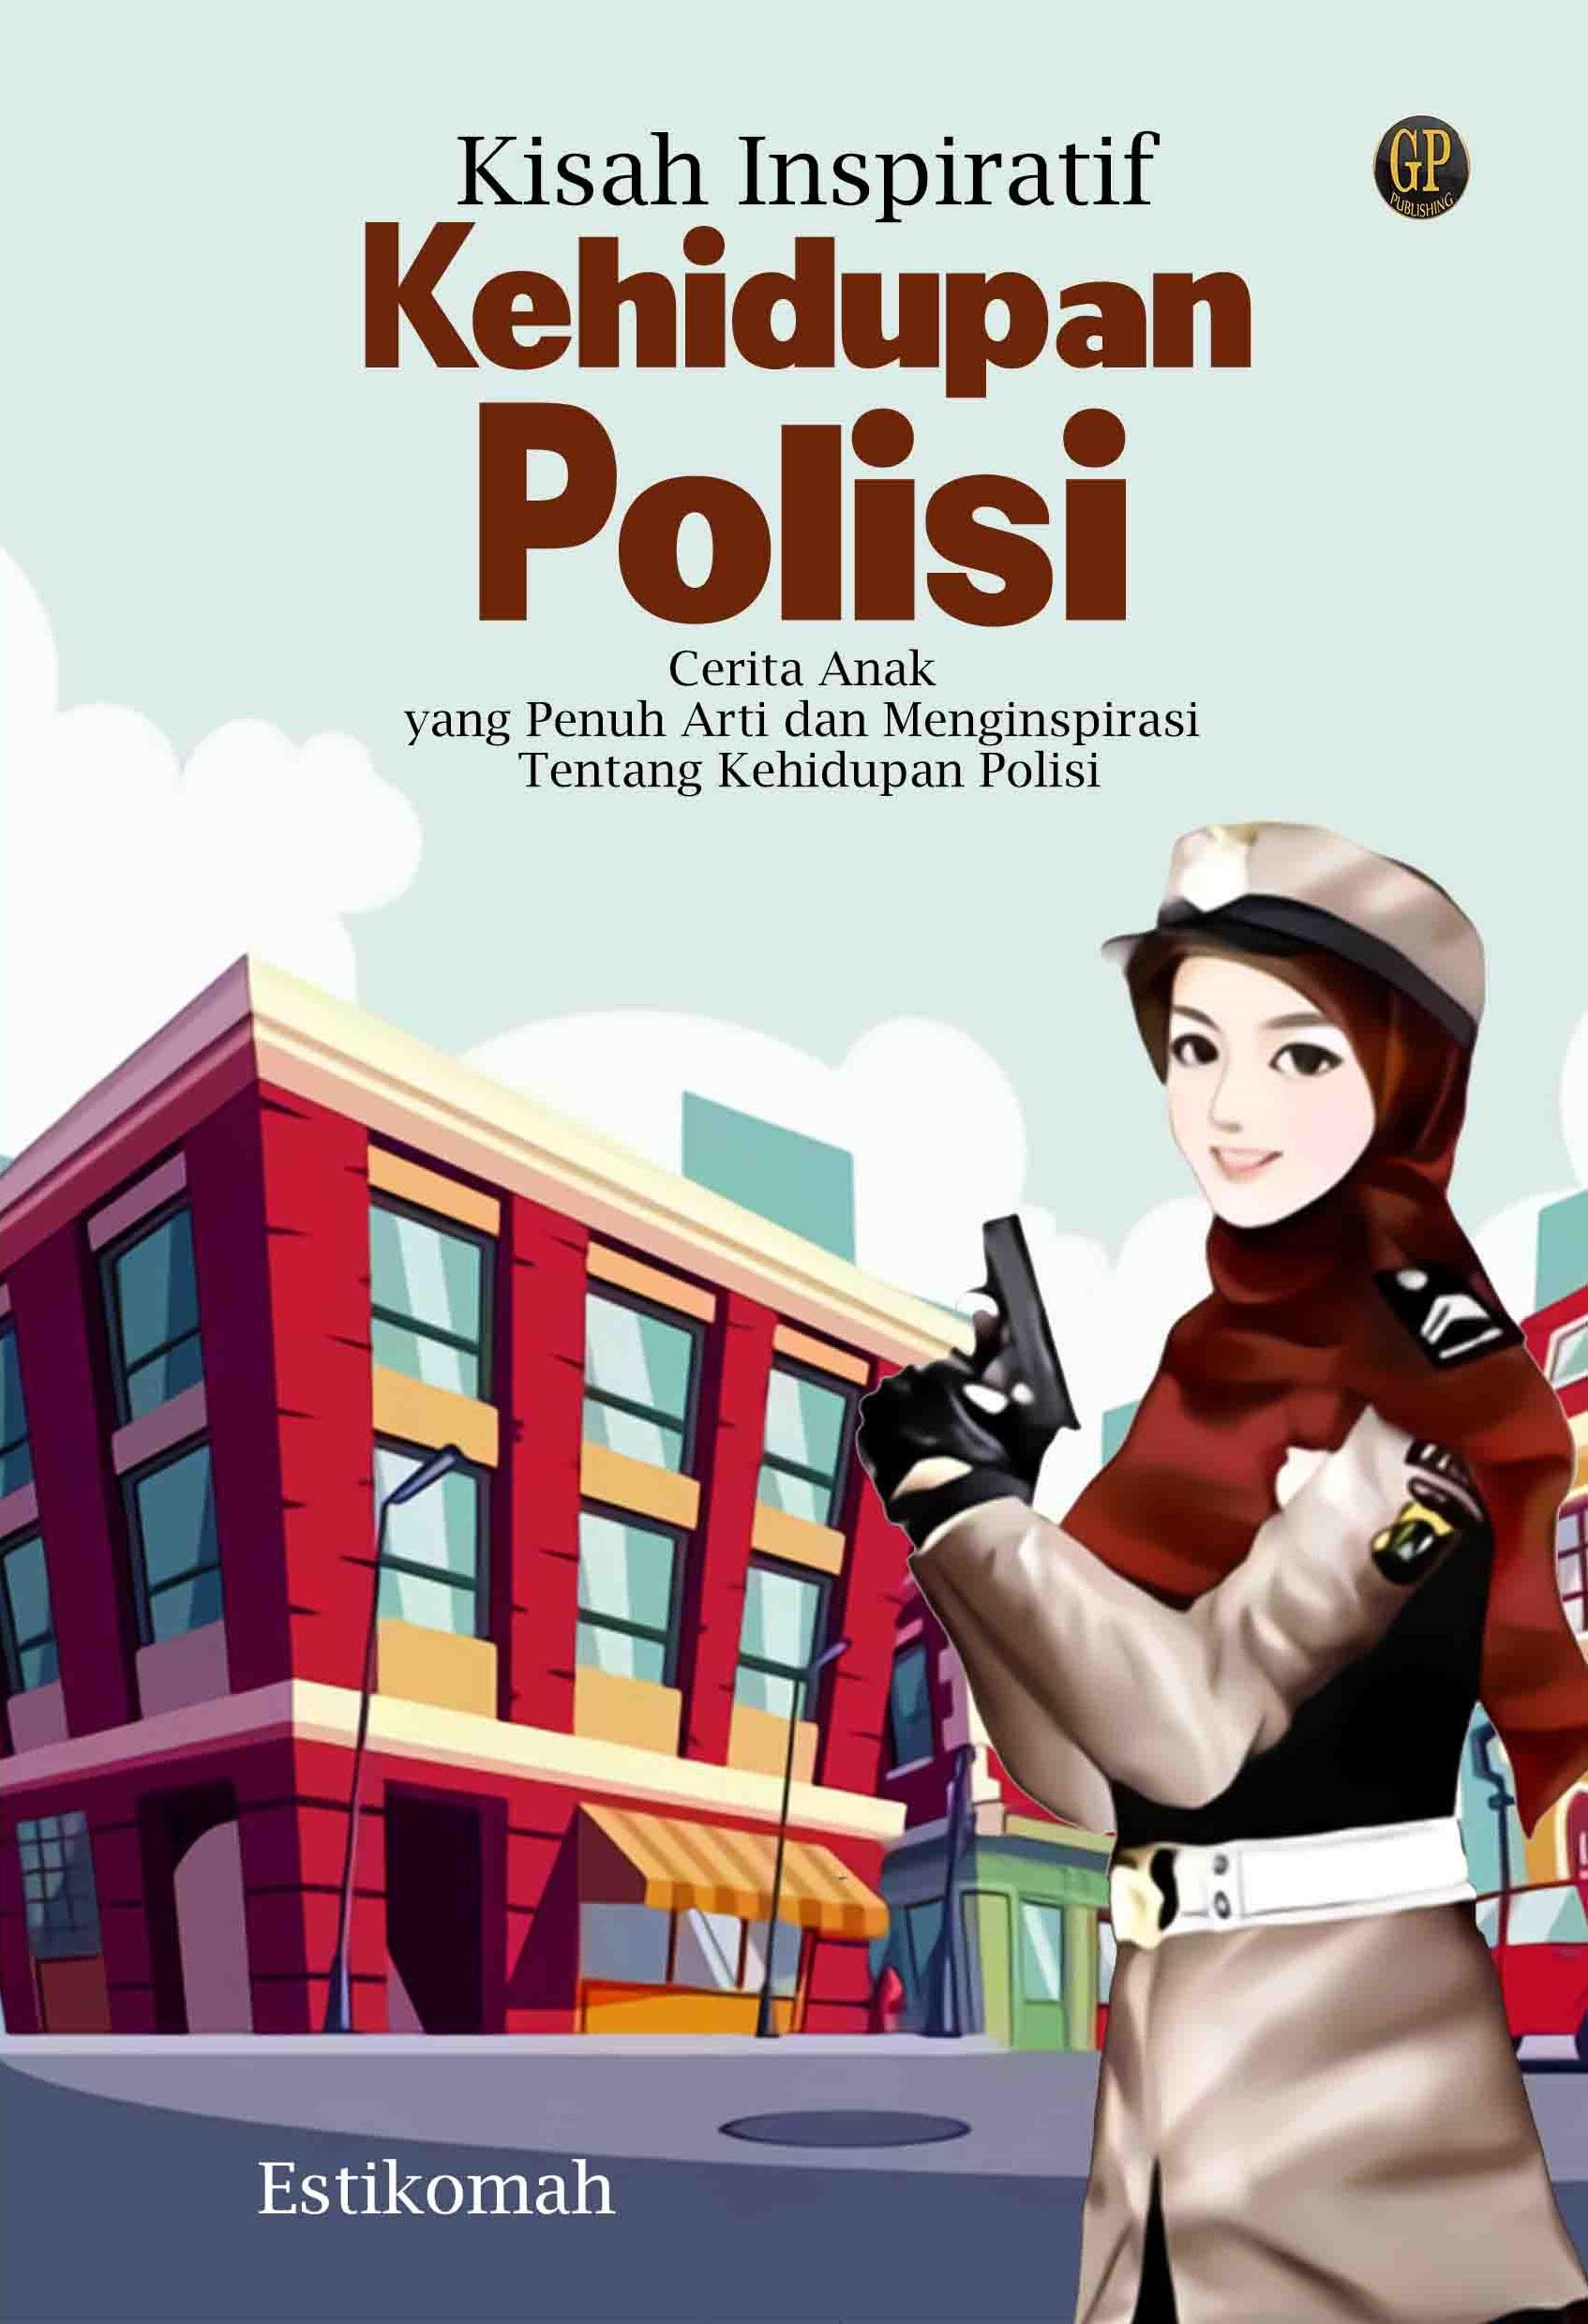 Kisah inspiratif kehidupan polisi [sumber elektronis]